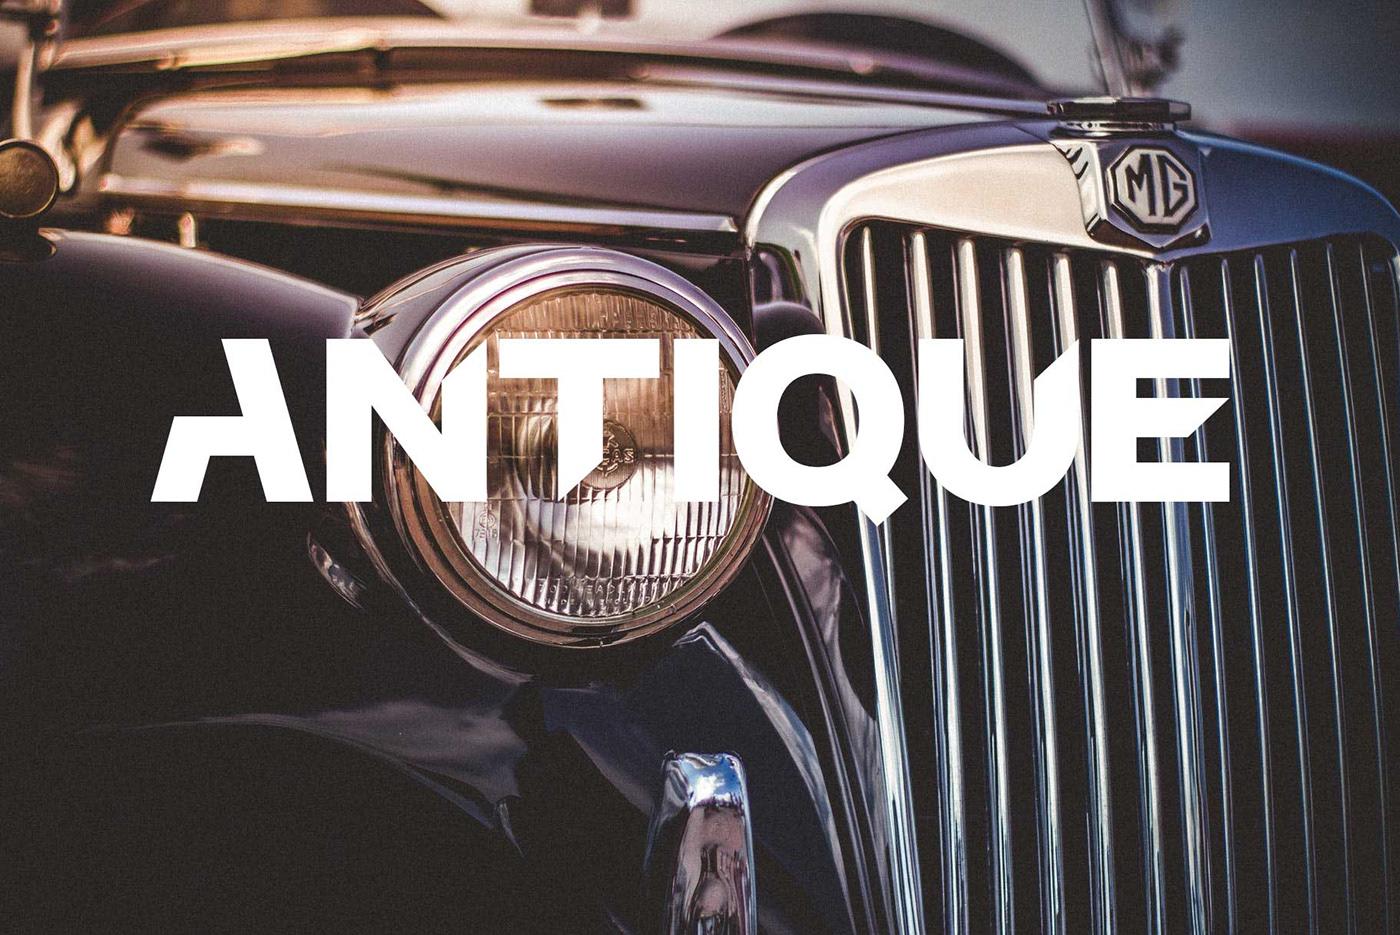 free download font freebie Typeface